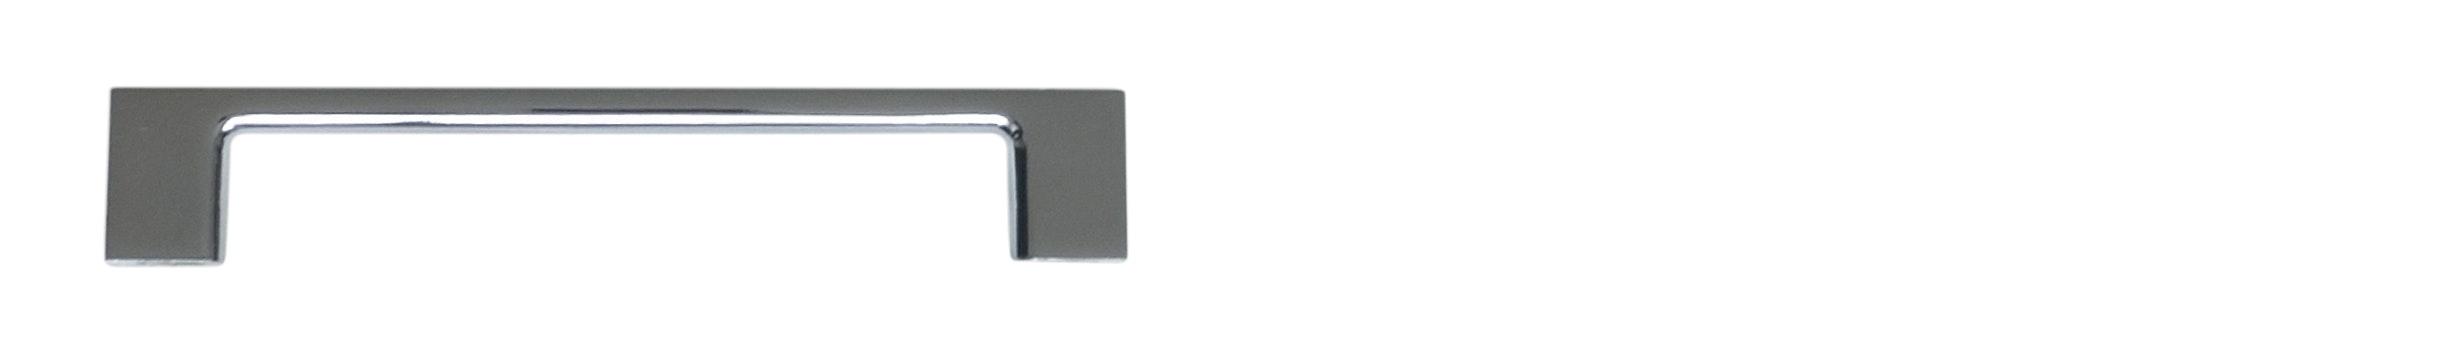 Handtag Noro Multi Krom C-C 128mm